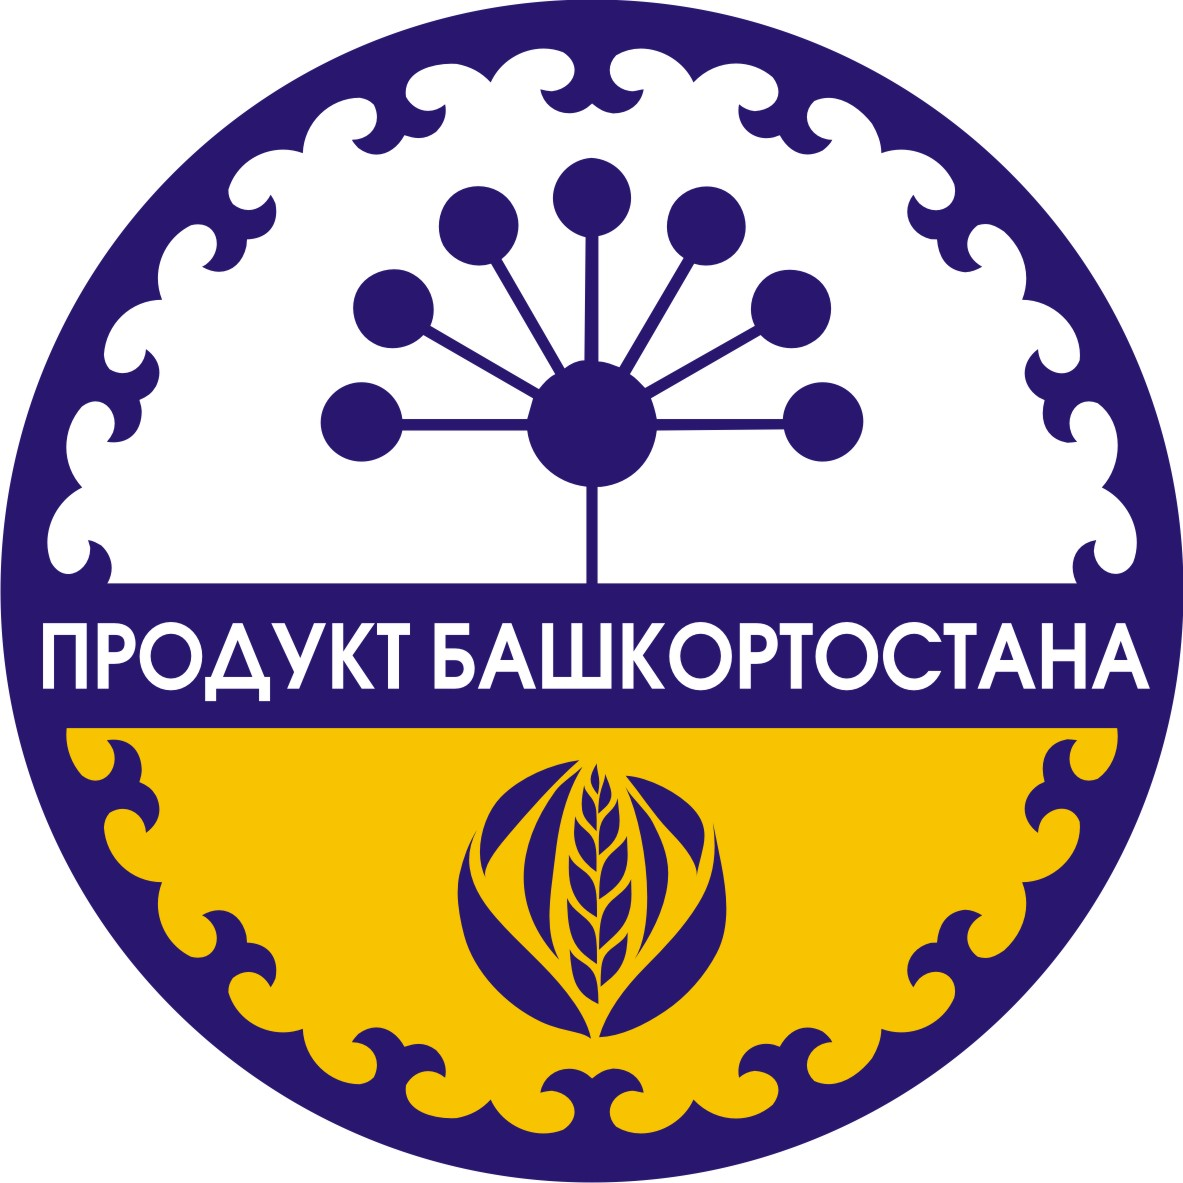 Продукт Башкортостана